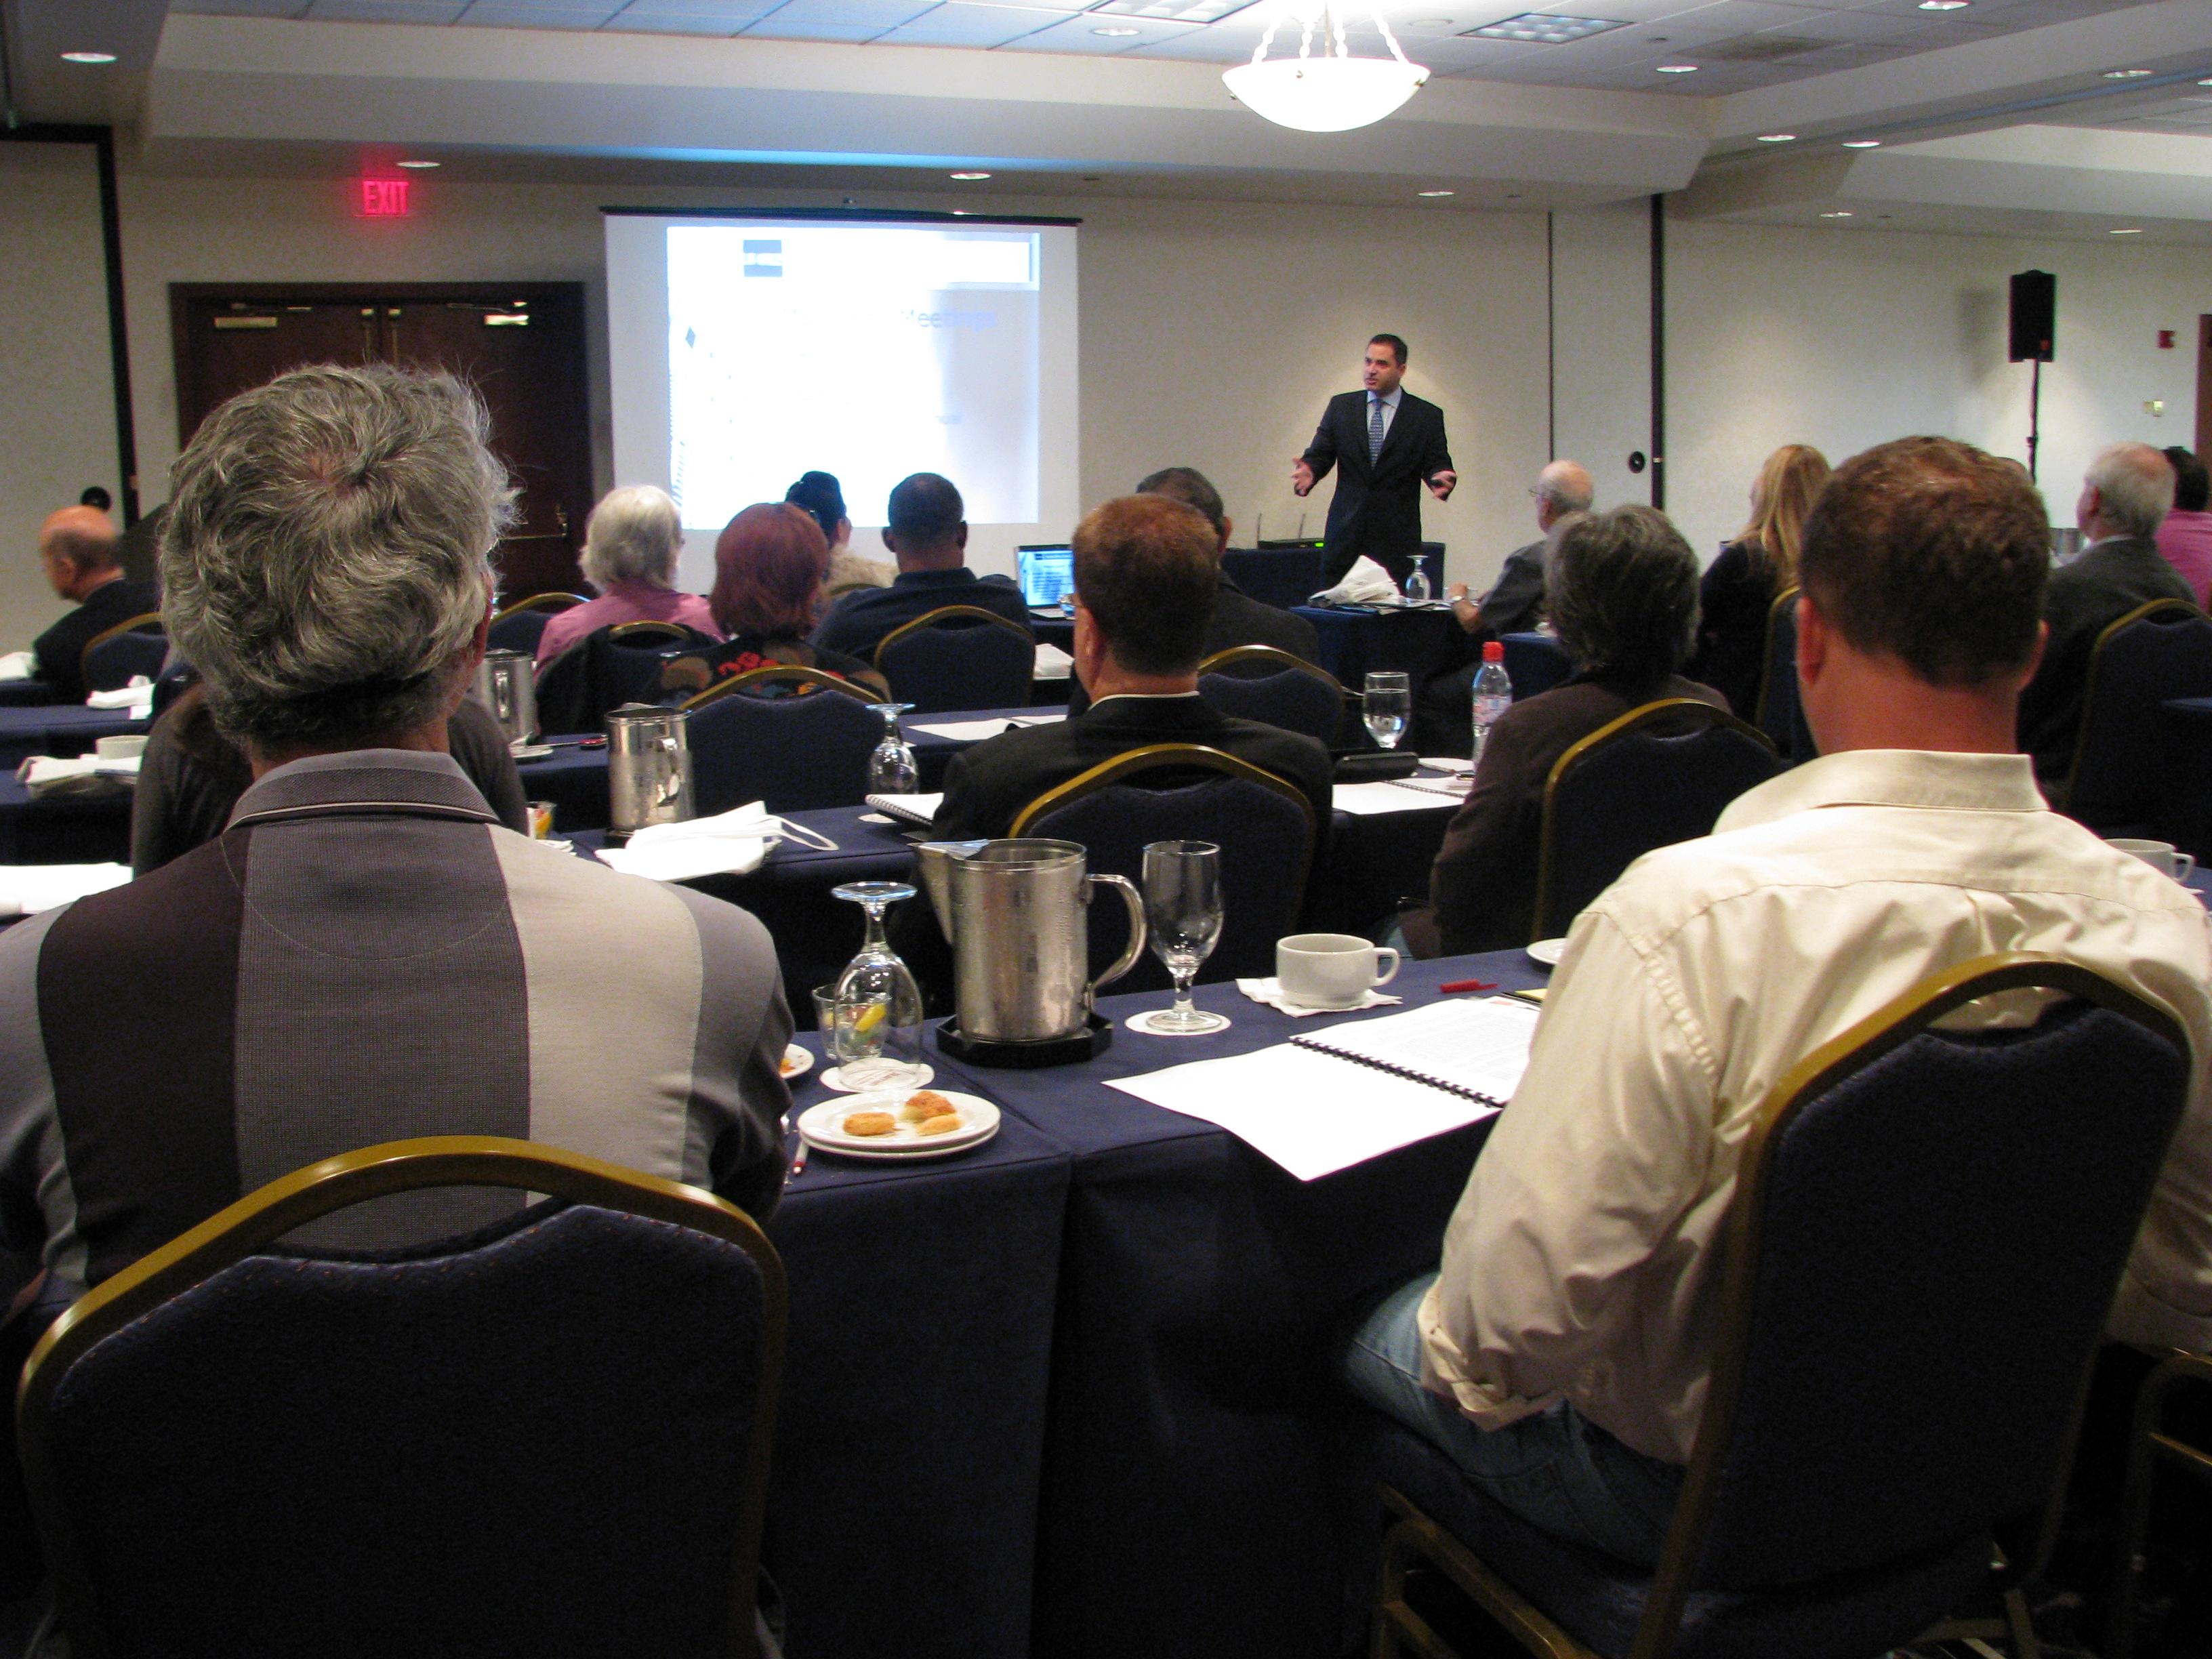 RBlanch seminar 1-17-11 photo 1.jpg